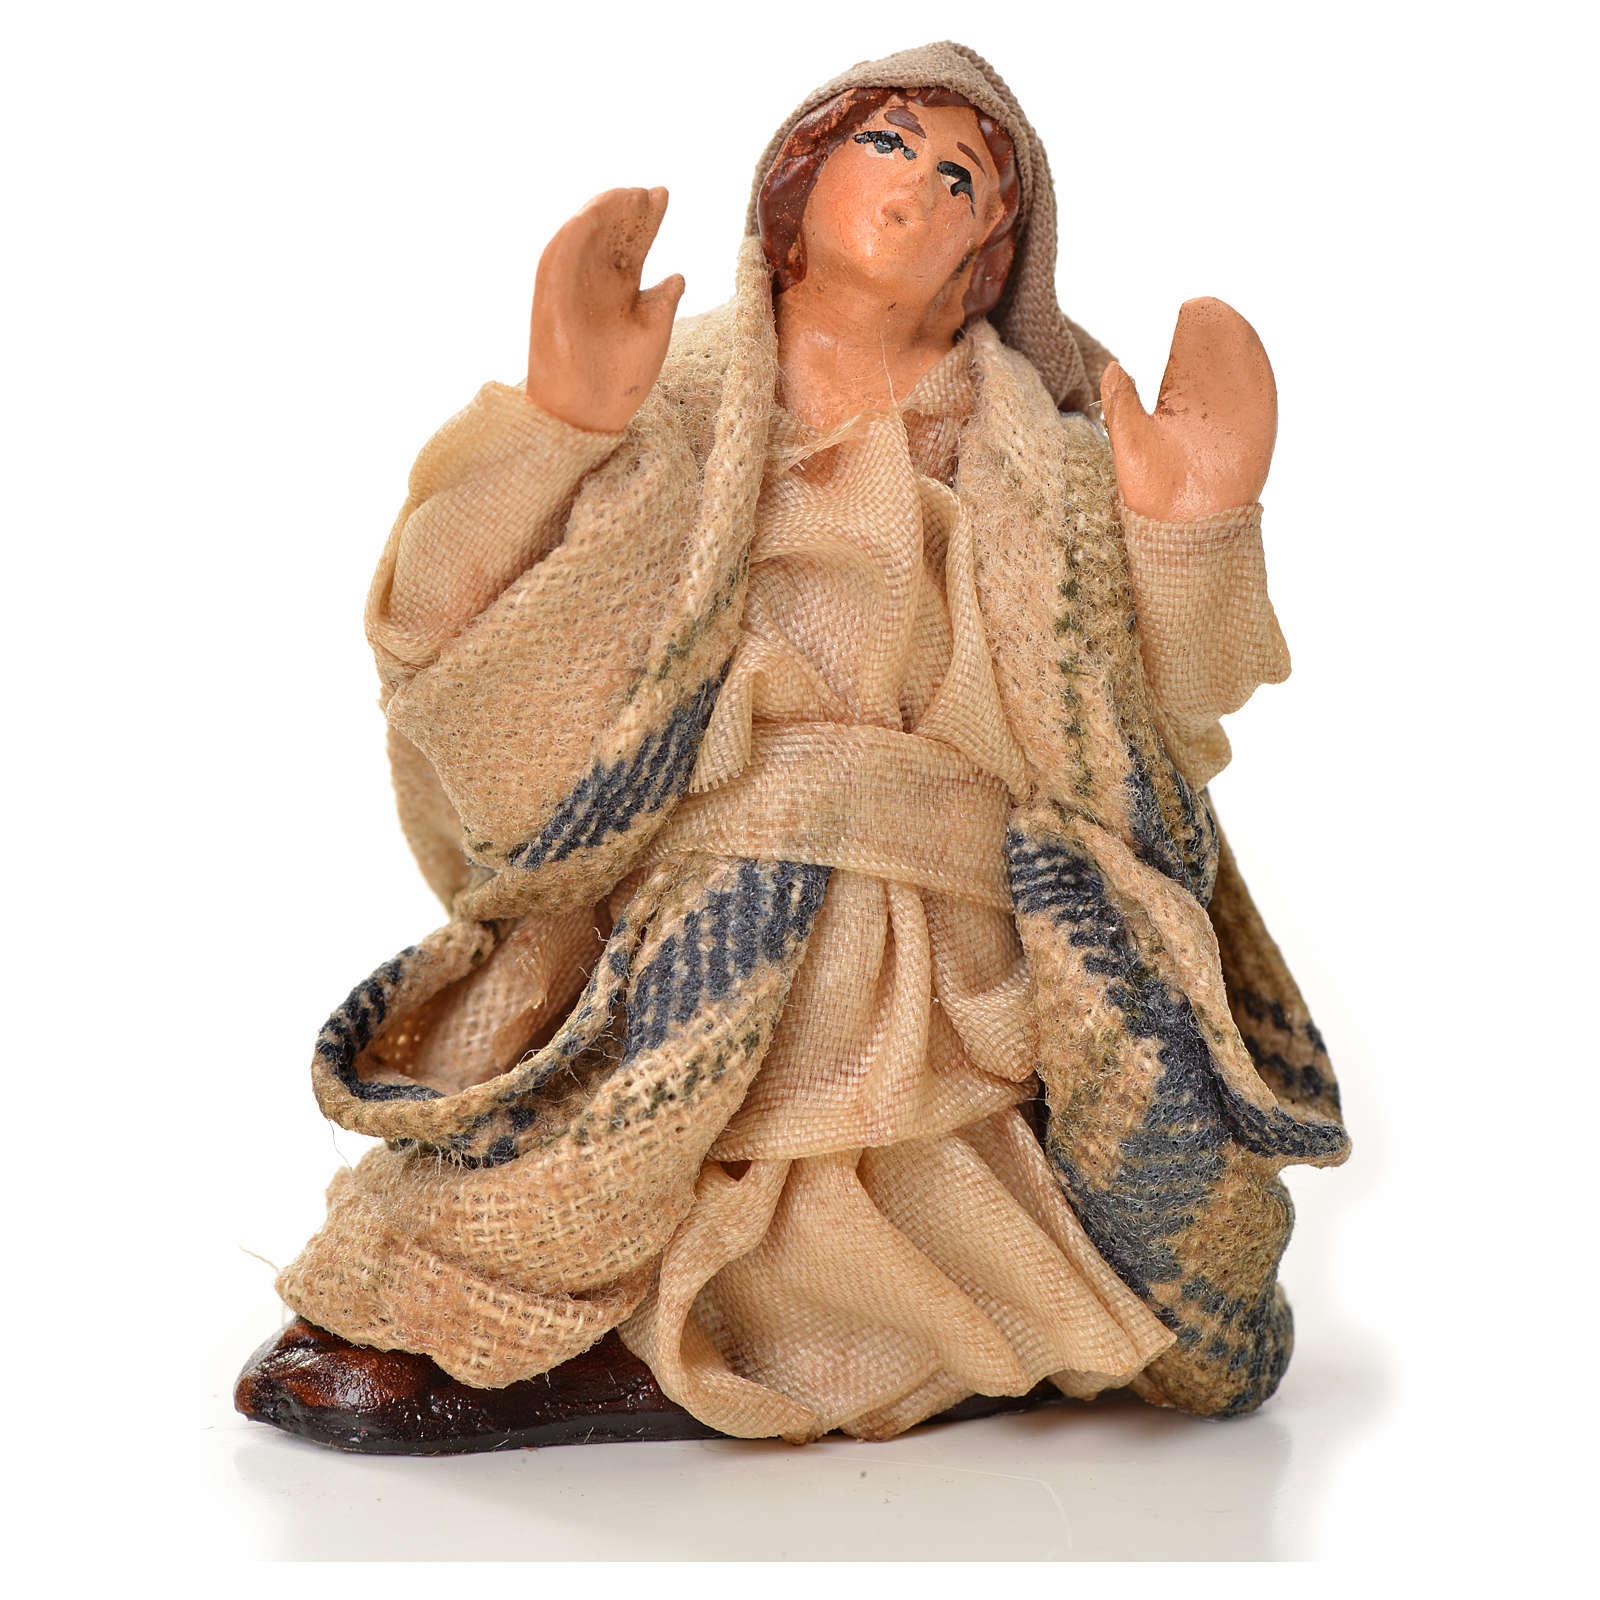 Neapolitan Nativity figurine, astonished man, 6 cm 4